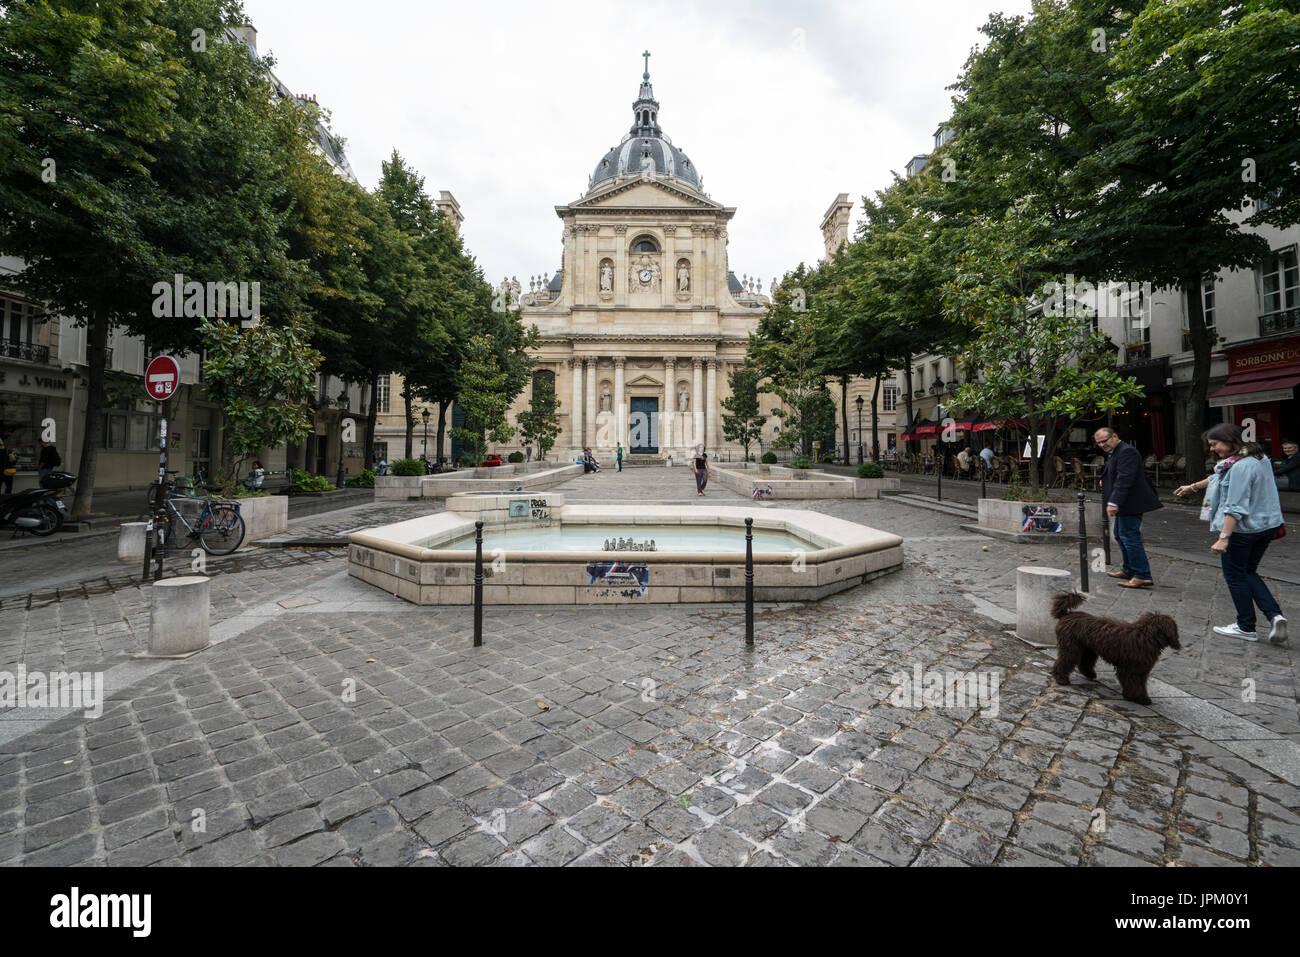 The Sorbonne university in Paris - Stock Image